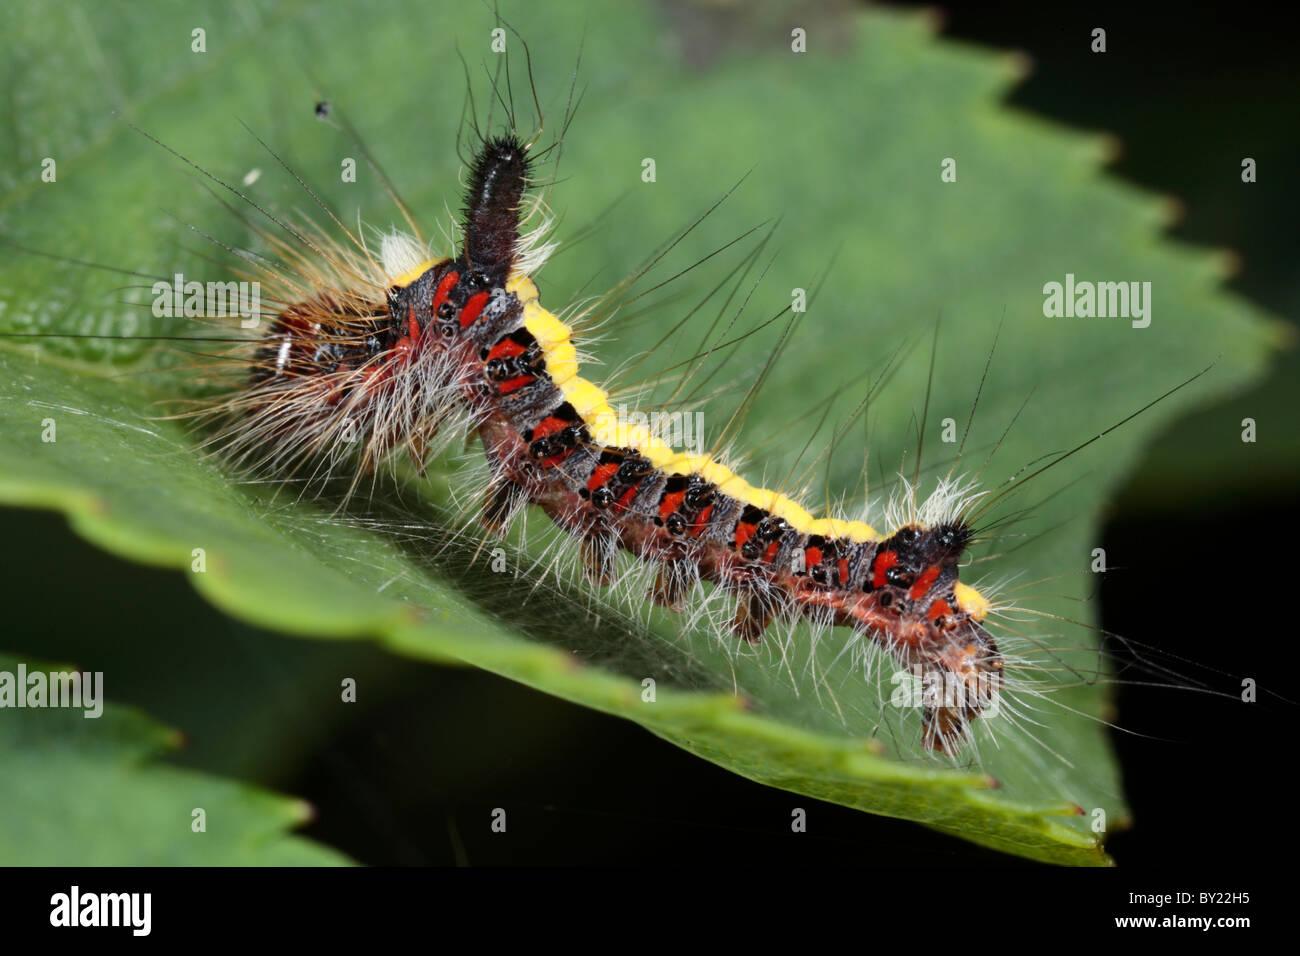 Larve einer grau Dolch Moth (Acronicta Psi) auf einem Rosenblatt. Powys, Wales. Stockbild